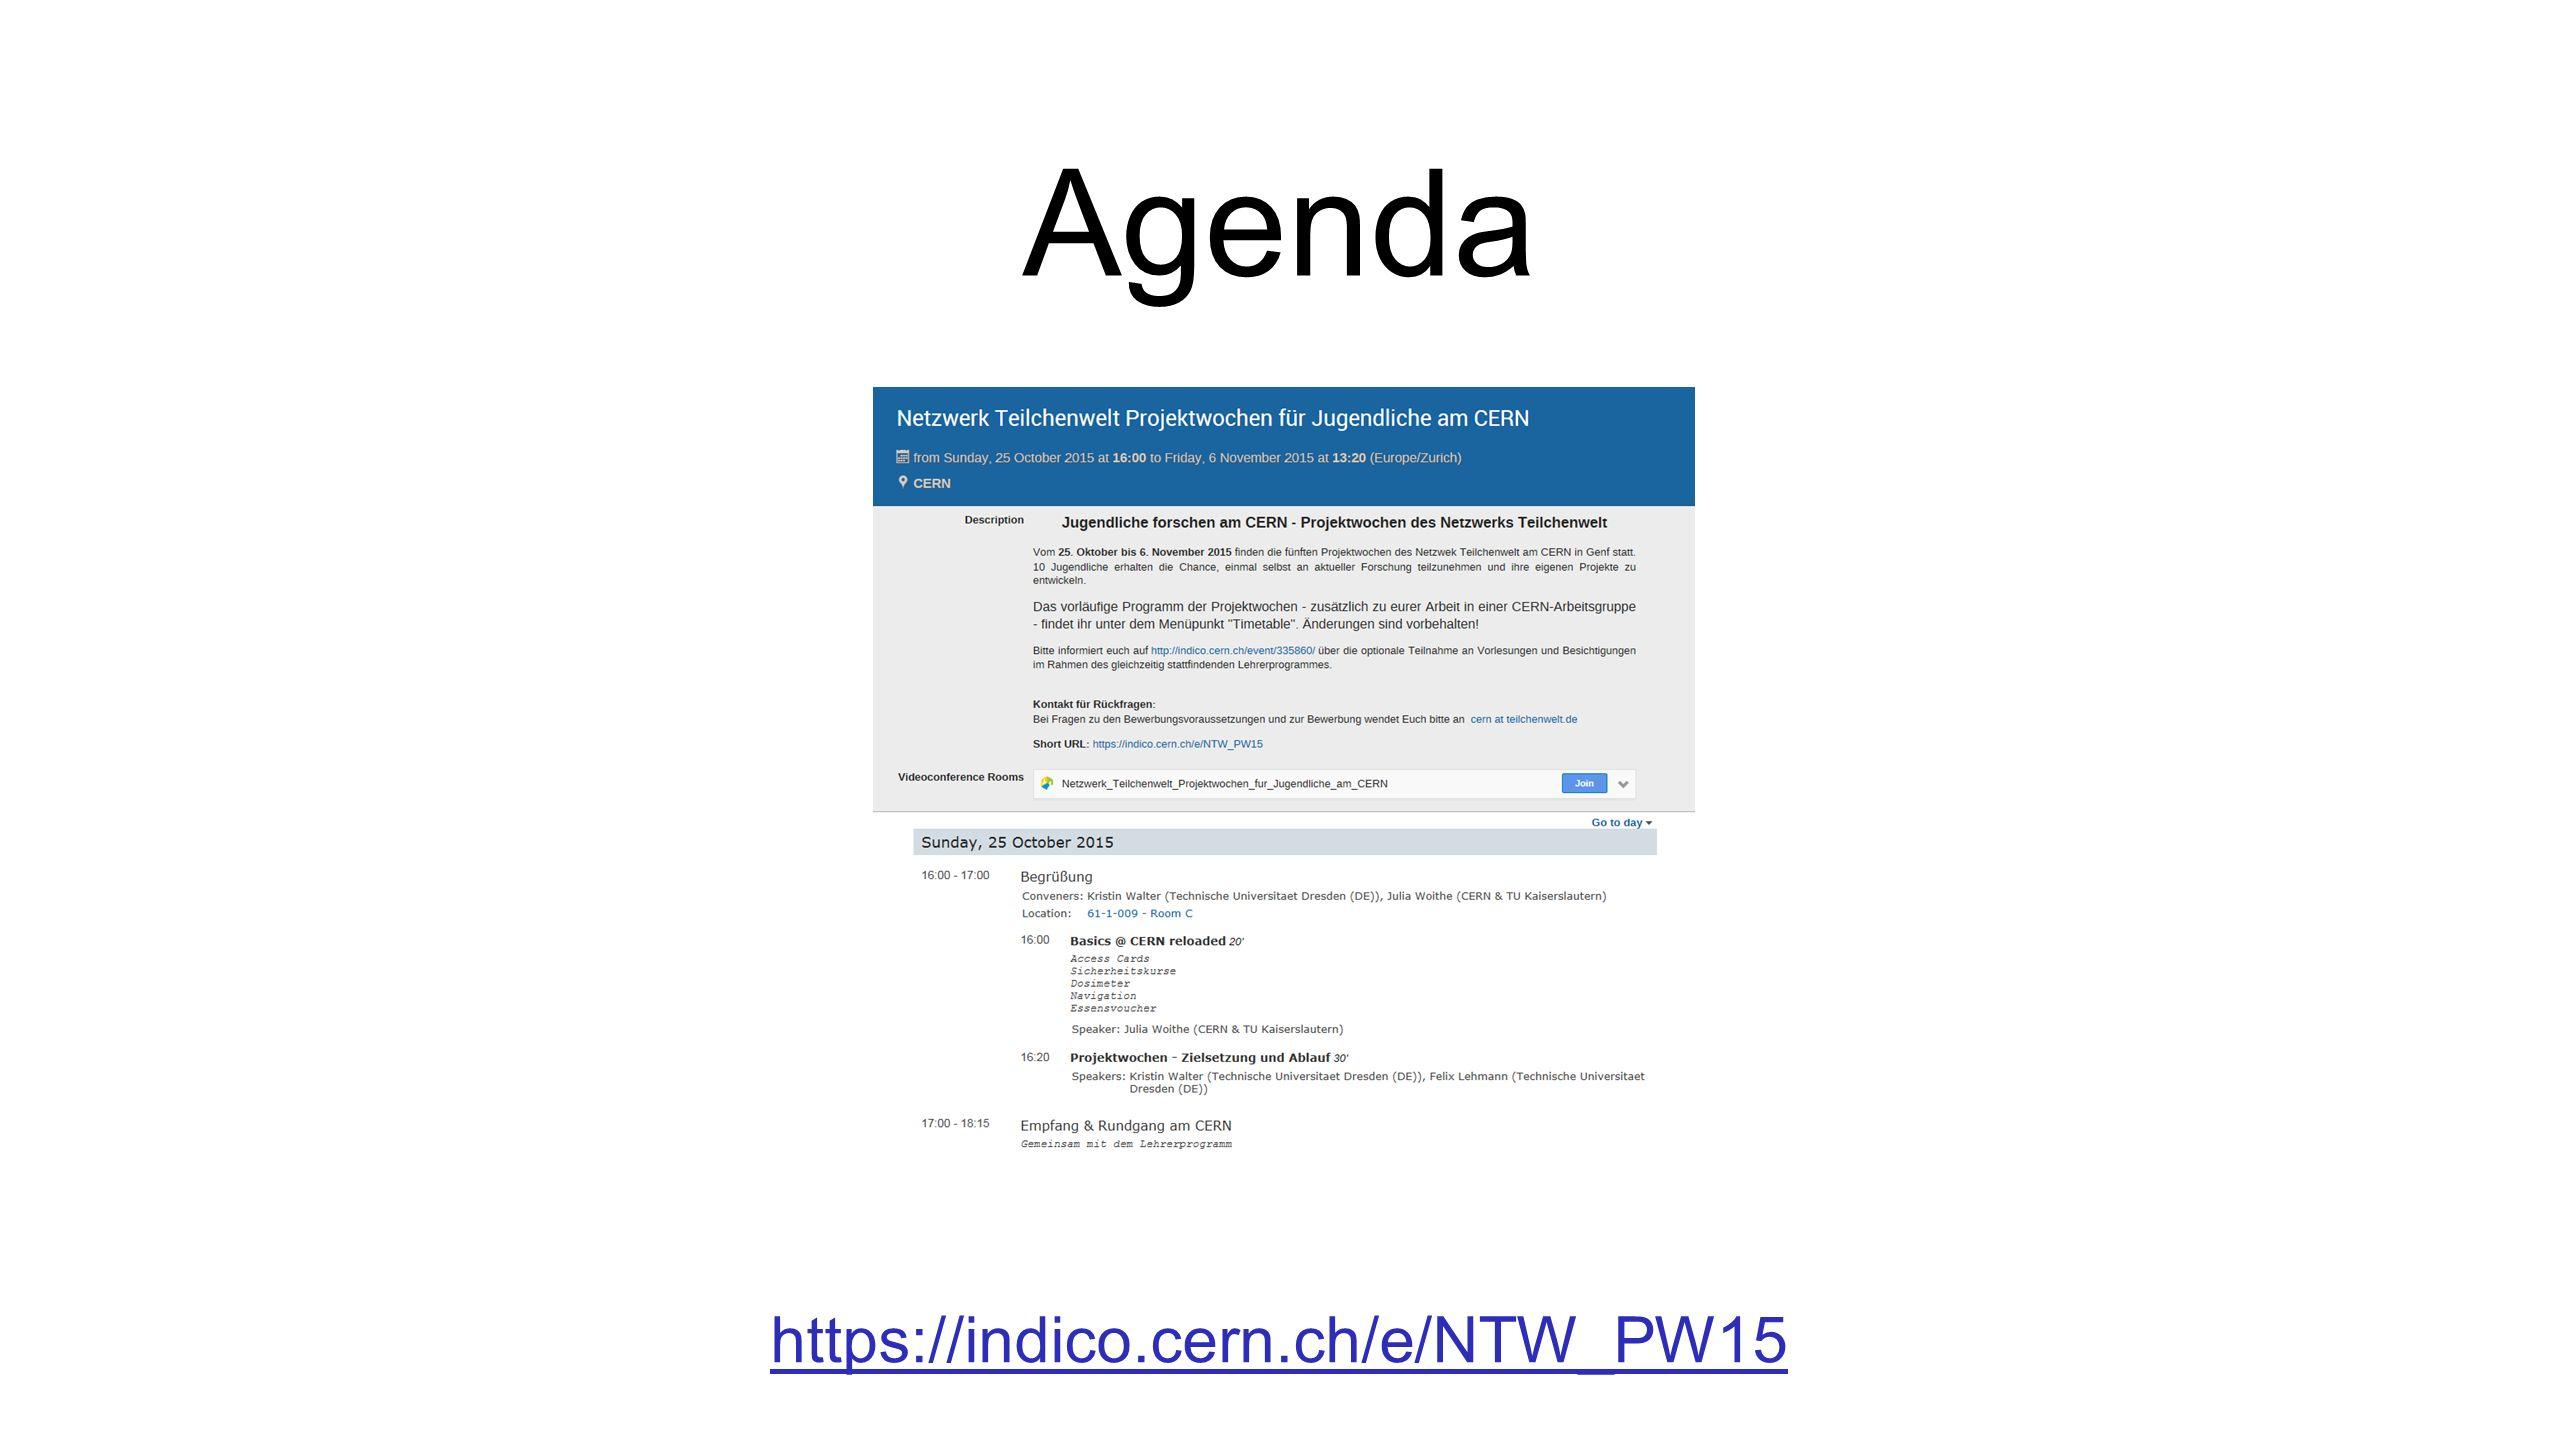 https://indico.cern.ch/e/NTW_PW15 Agenda